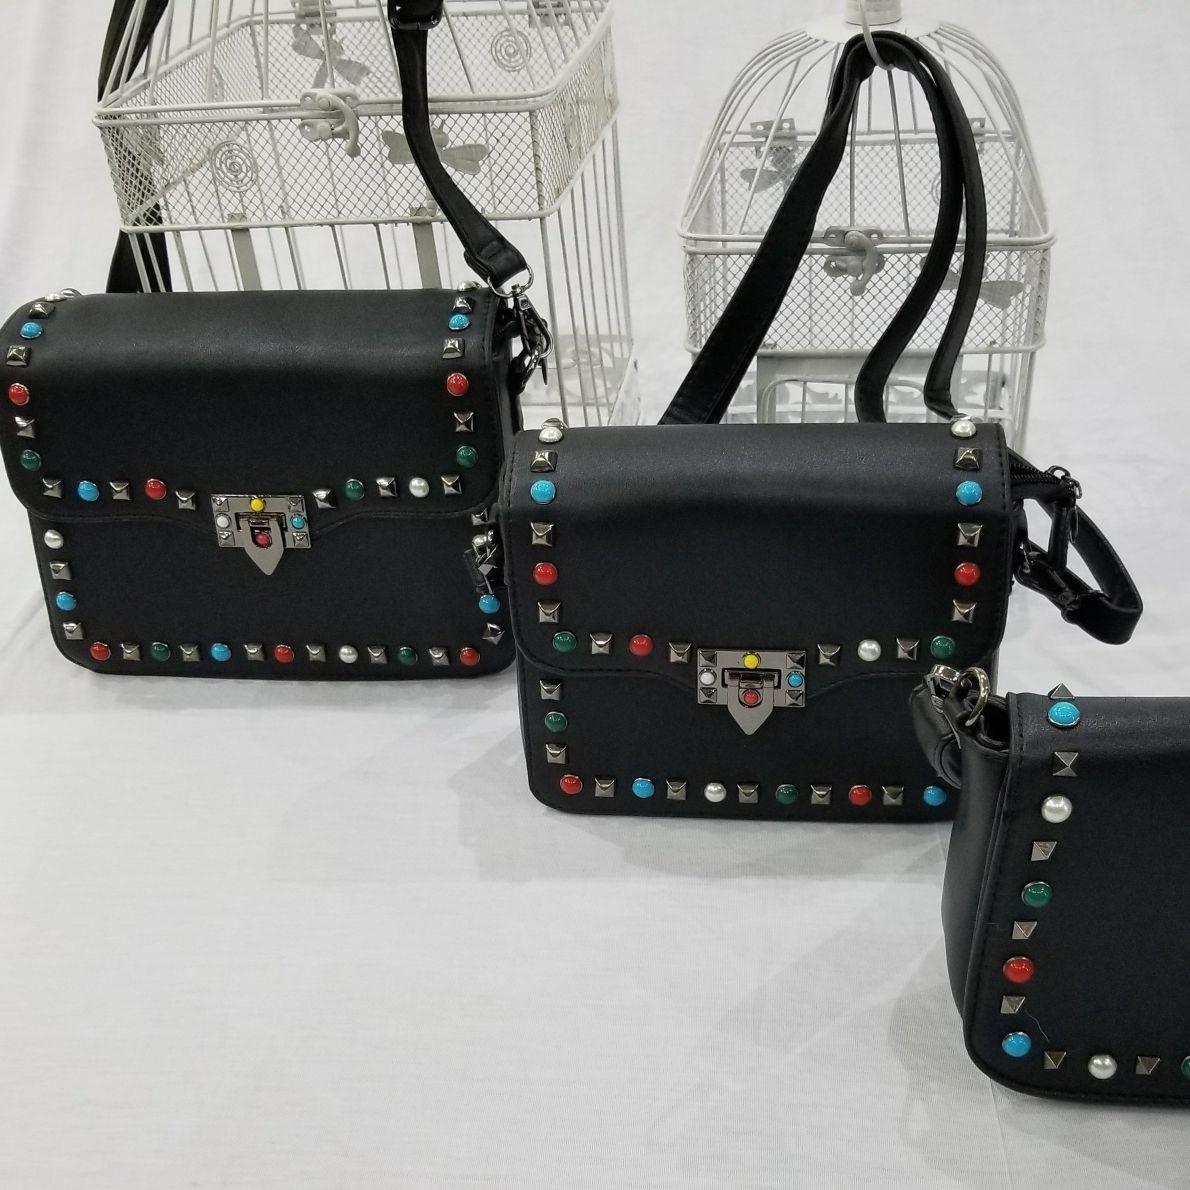 561904ea8 Bolsa Kit Com 3 Peças Feminina Inspired Valentino Taxas - R$ 180,00 ...